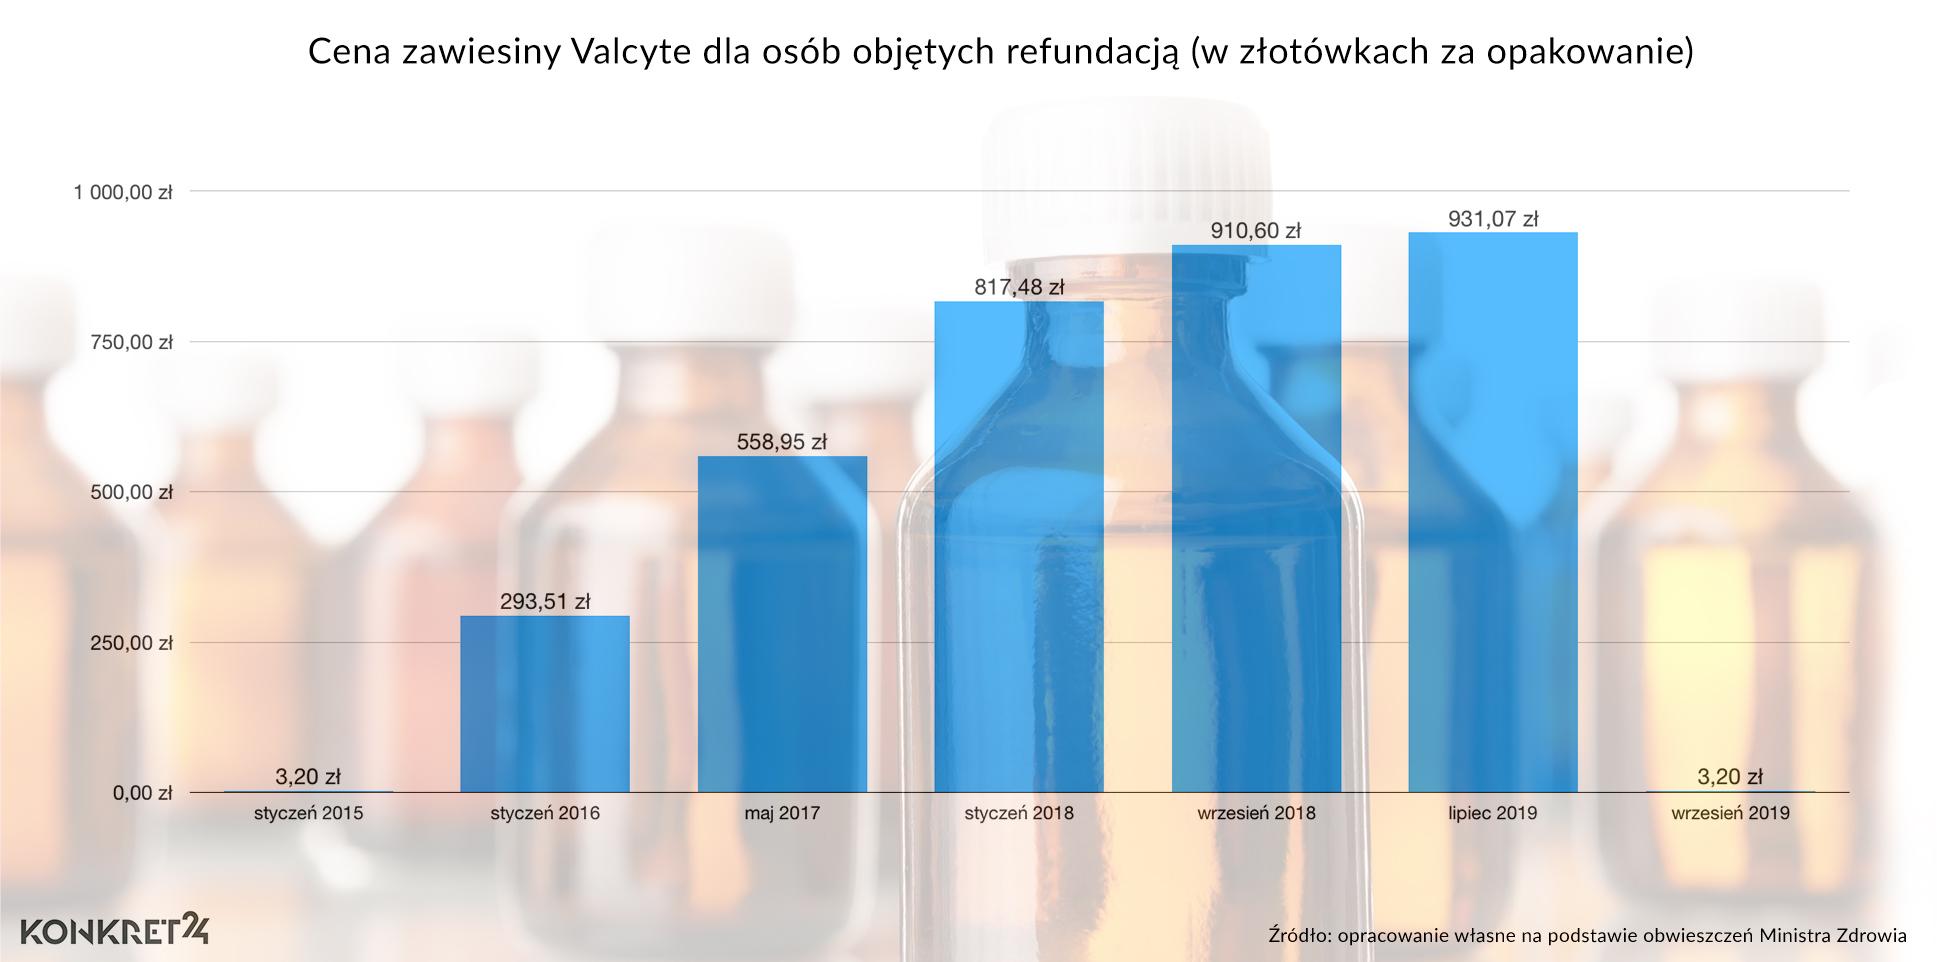 Cena refundowanego leku Valcyte